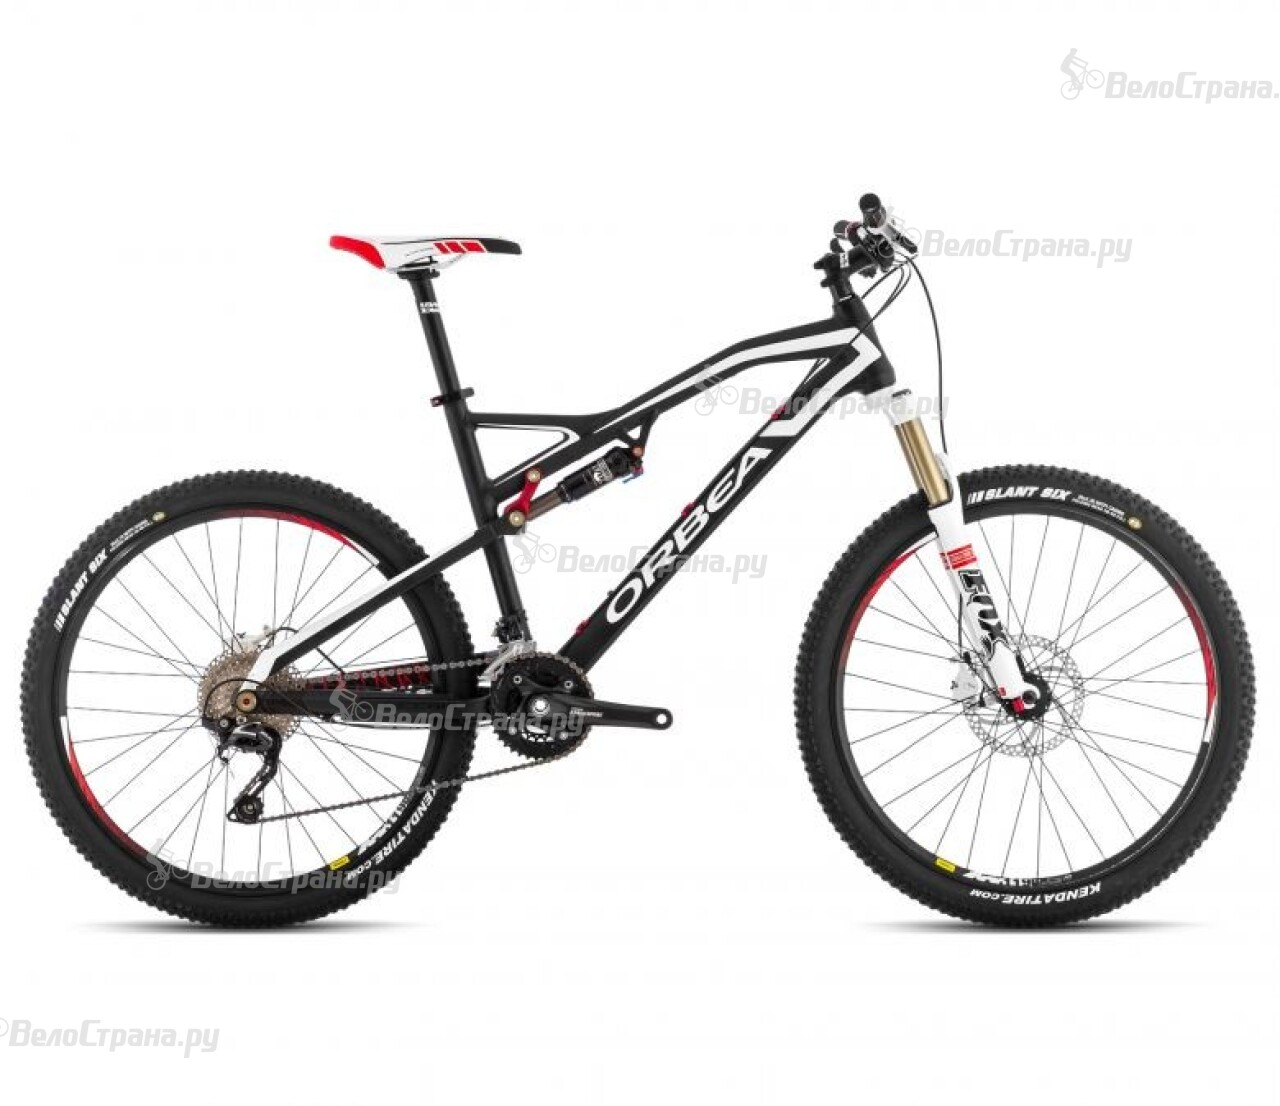 Велосипед Orbea Occam H30 (2014) велосипед orbea travel h30 2014